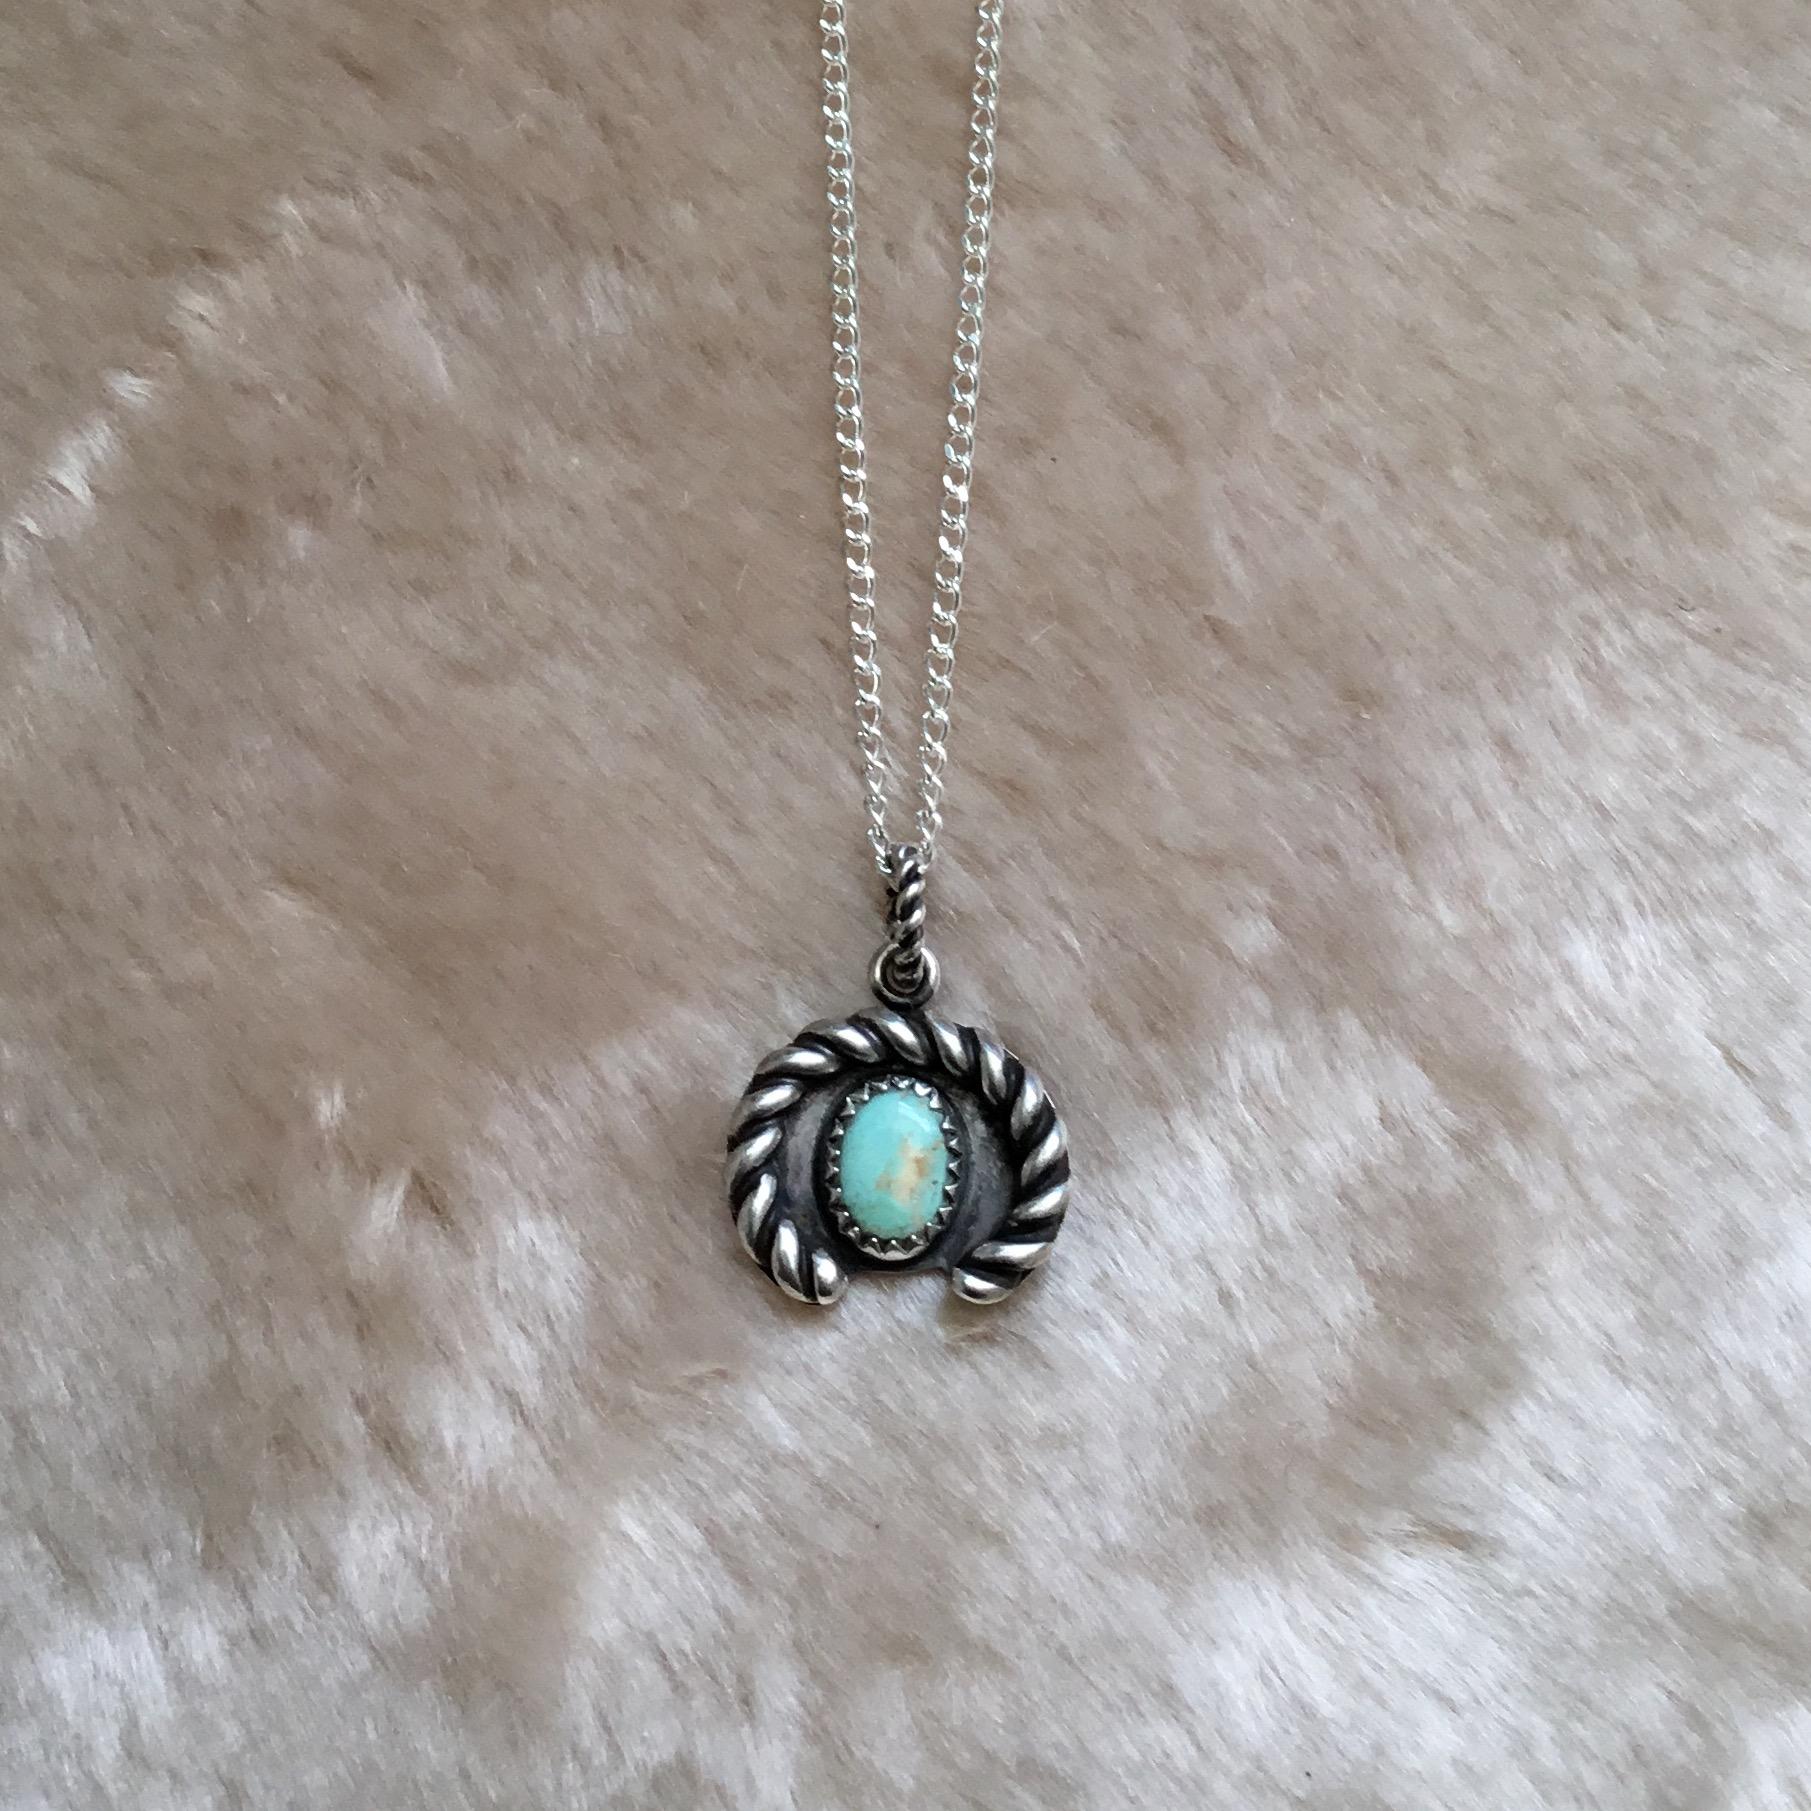 Turquoise horseshoe pendant rish jewelry online store powered by turquoise horseshoe pendant aloadofball Gallery